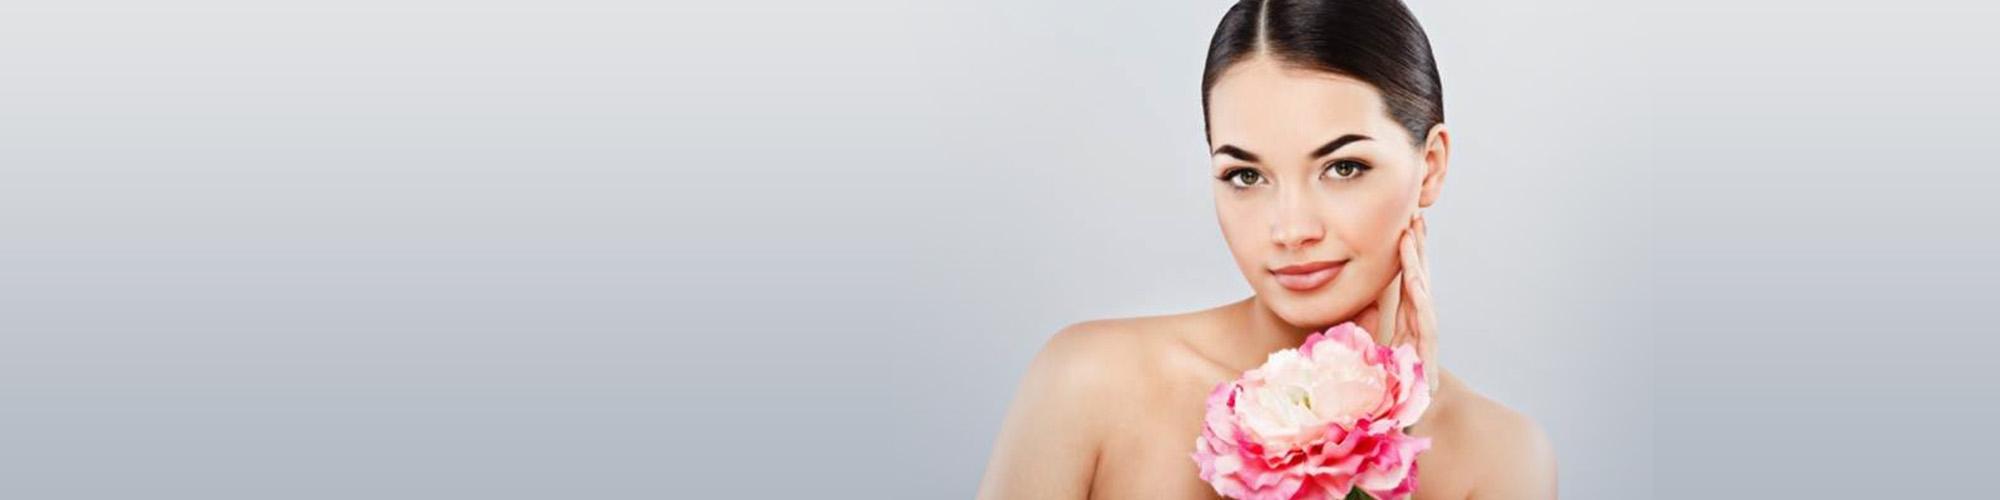 Skintek Beauty Clinic (@skintek) Cover Image